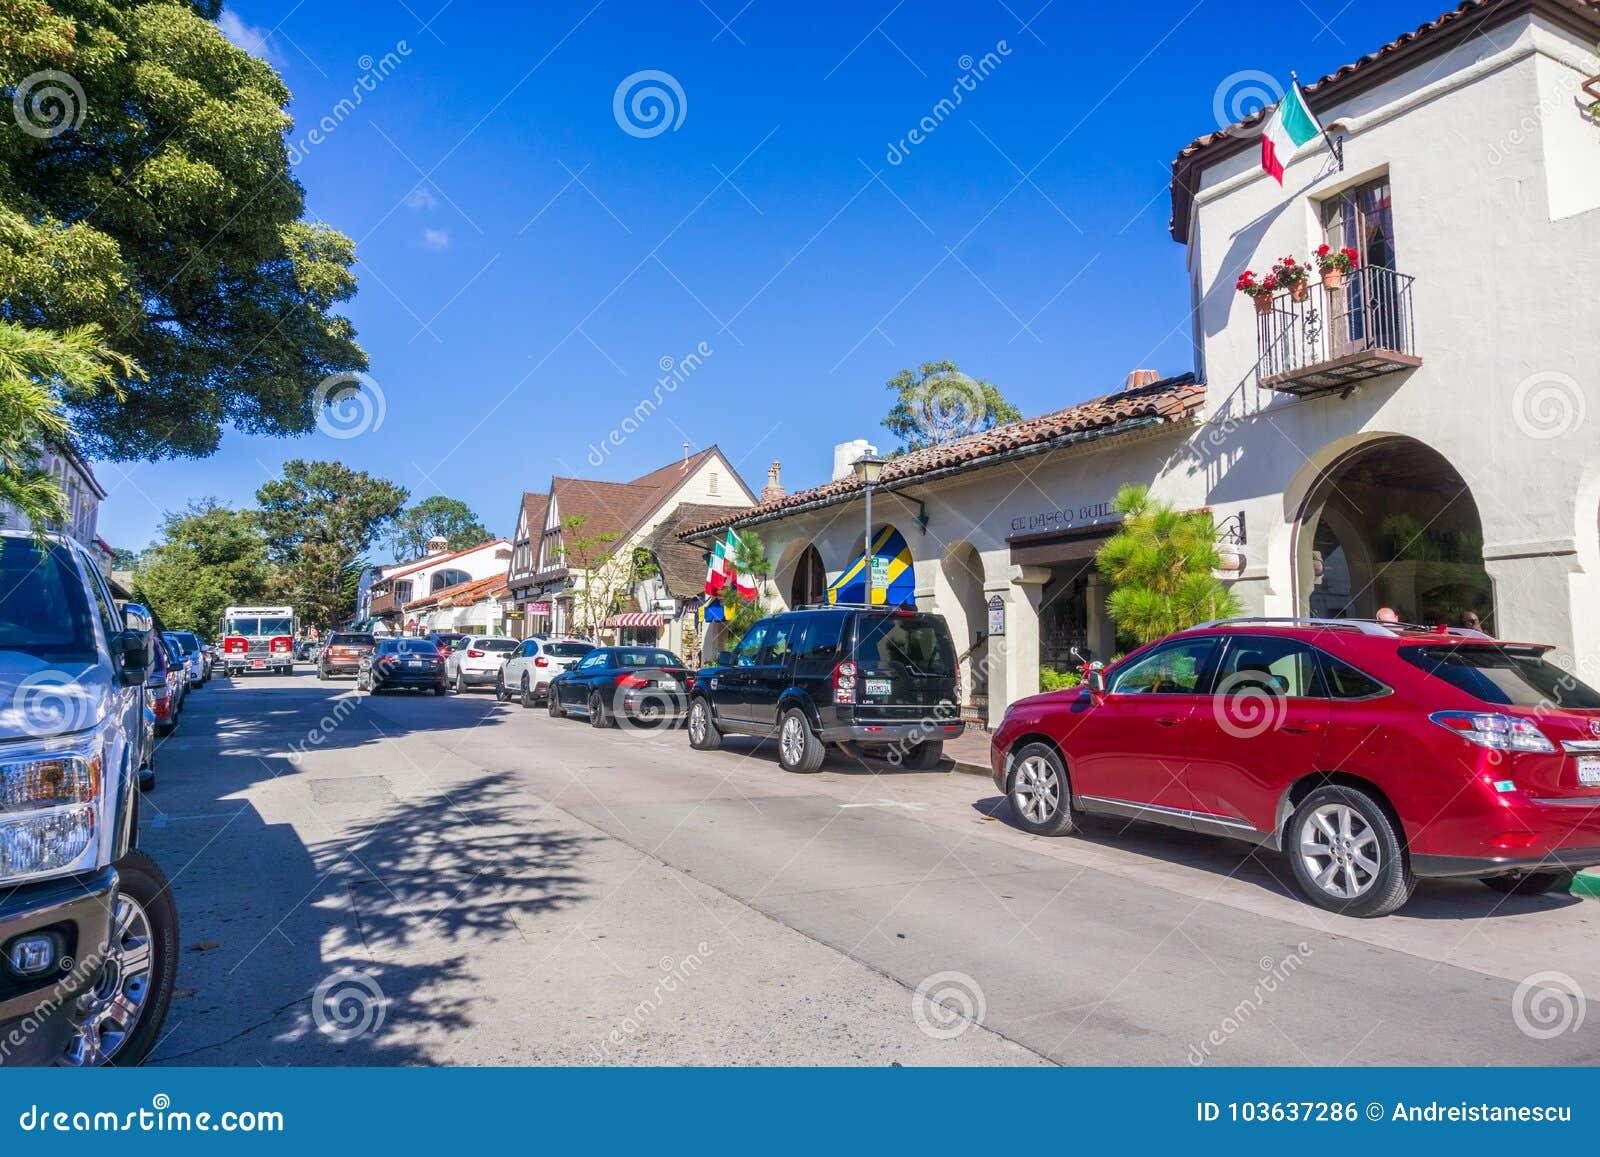 Ruchliwa ulica w w centrum Carmel, Monterey półwysep, Kalifornia